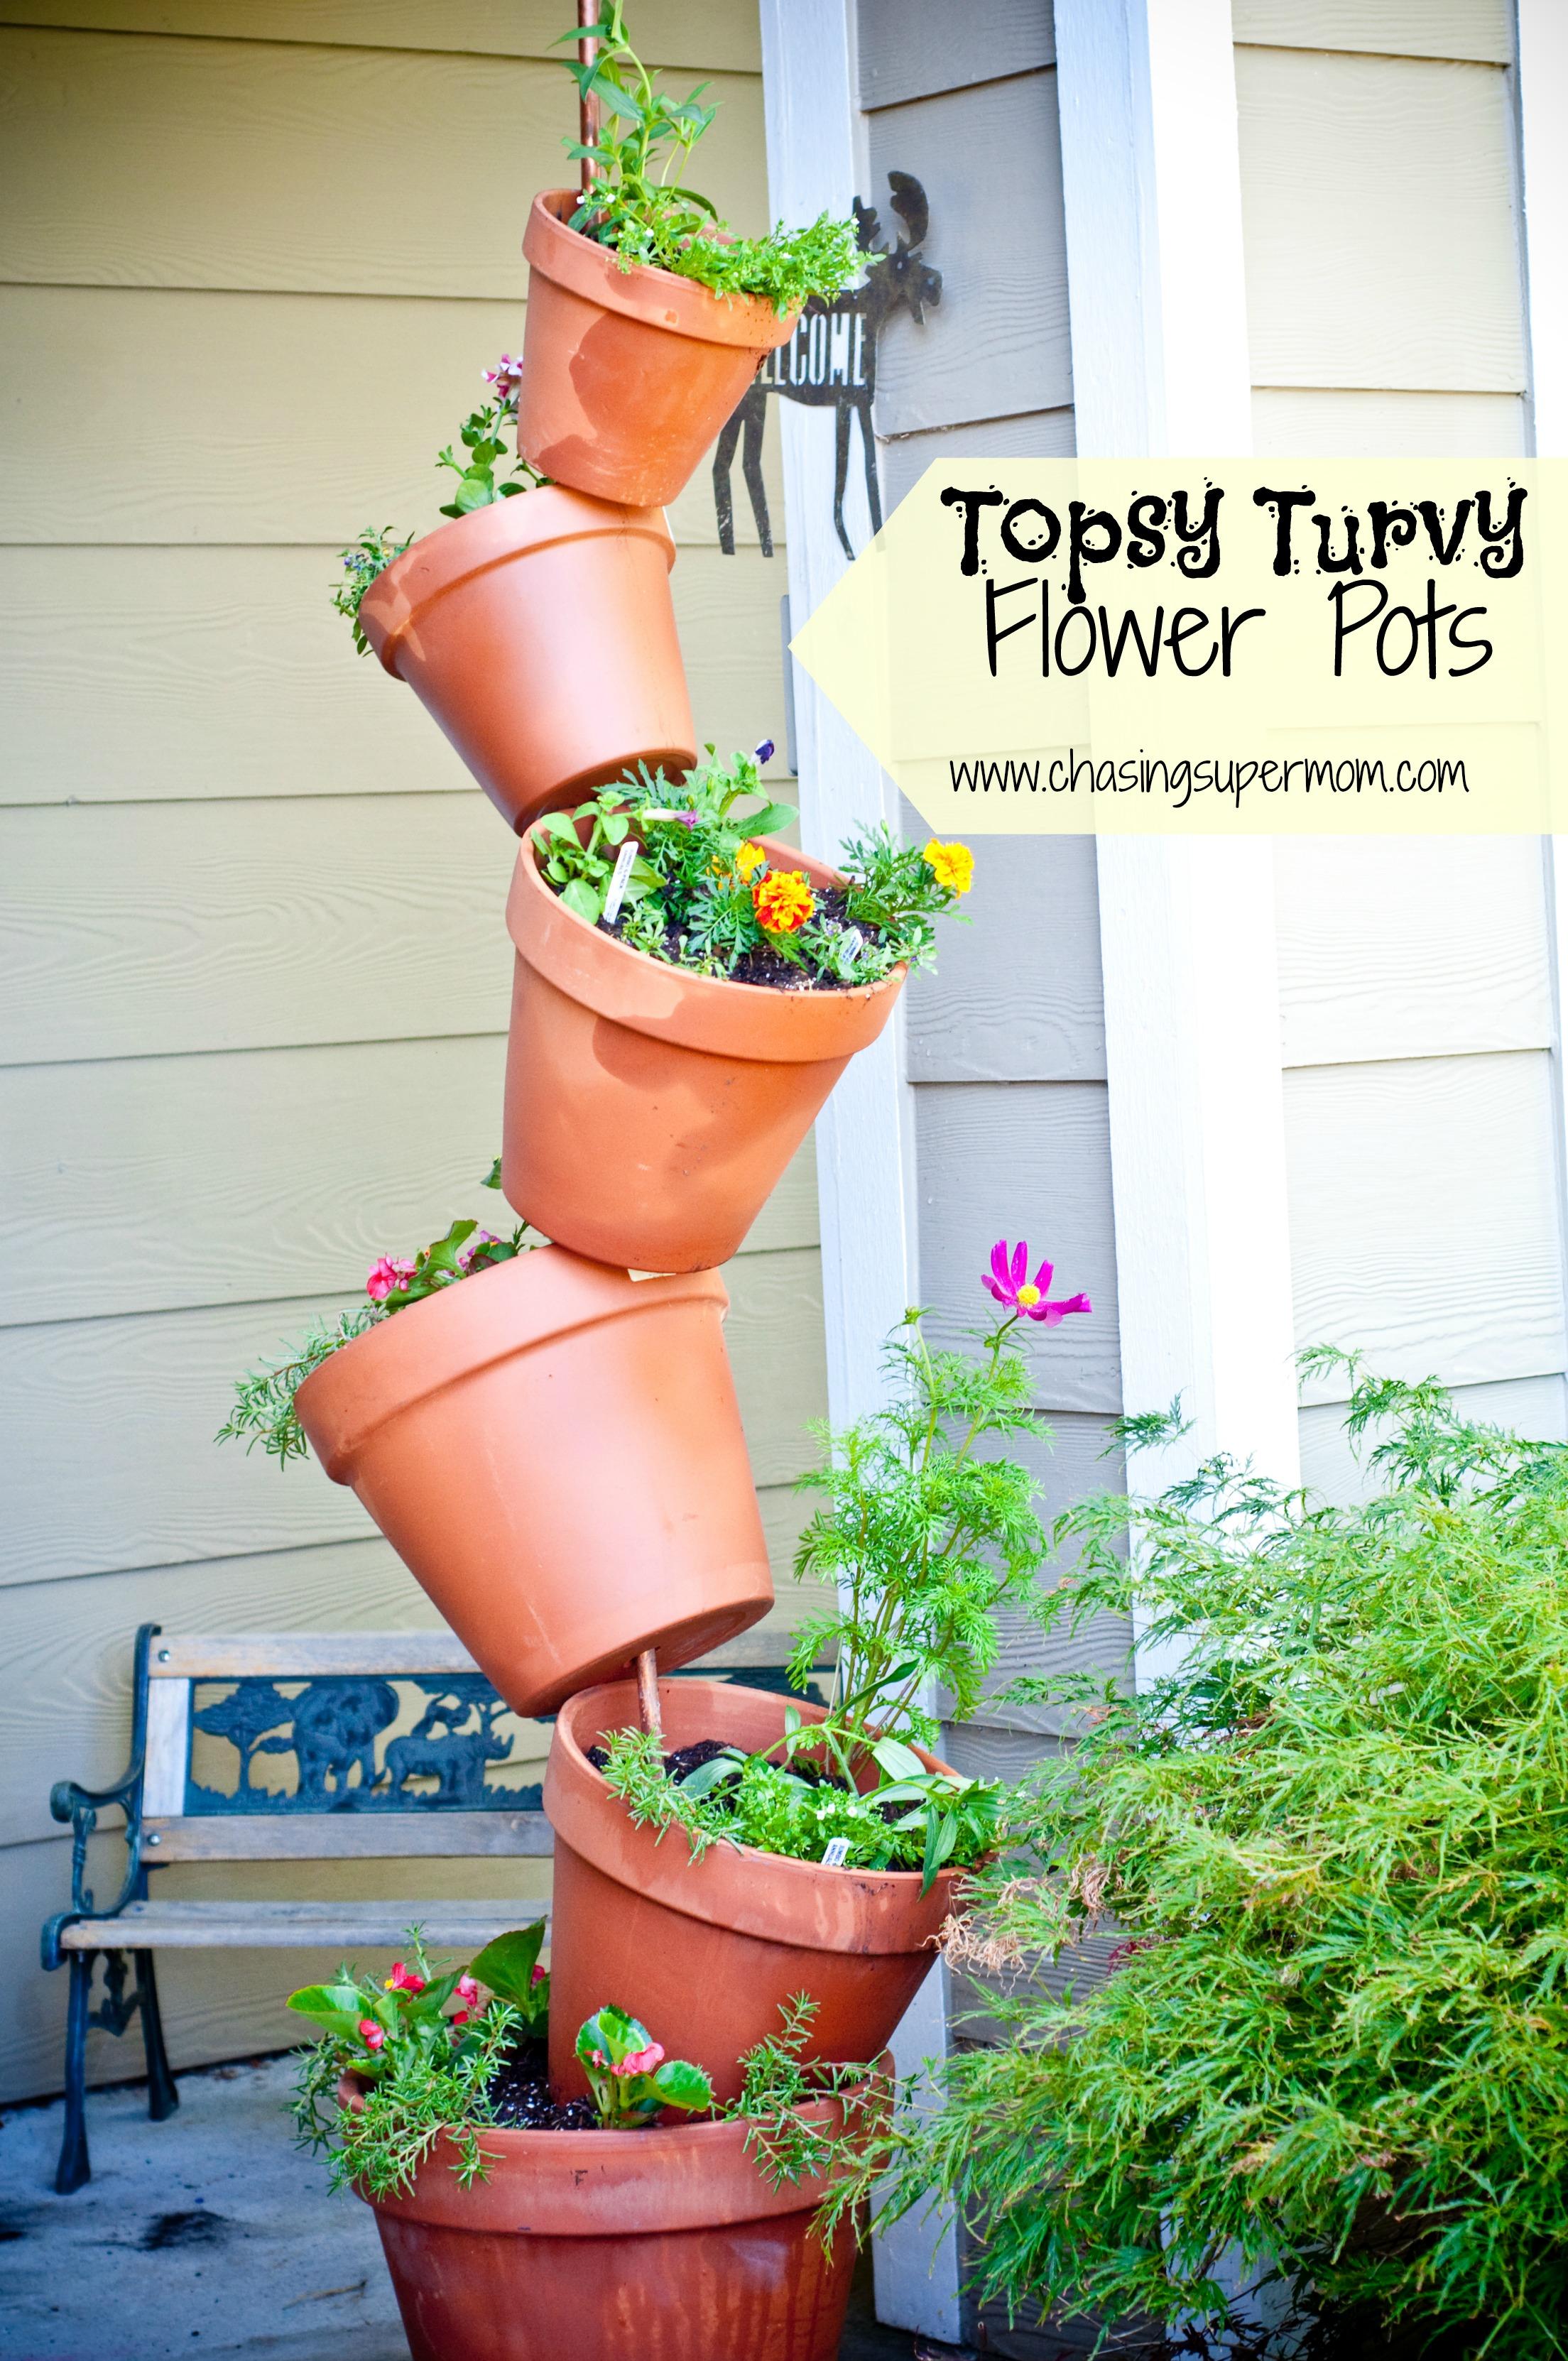 Topsy Turvy Flower Pots